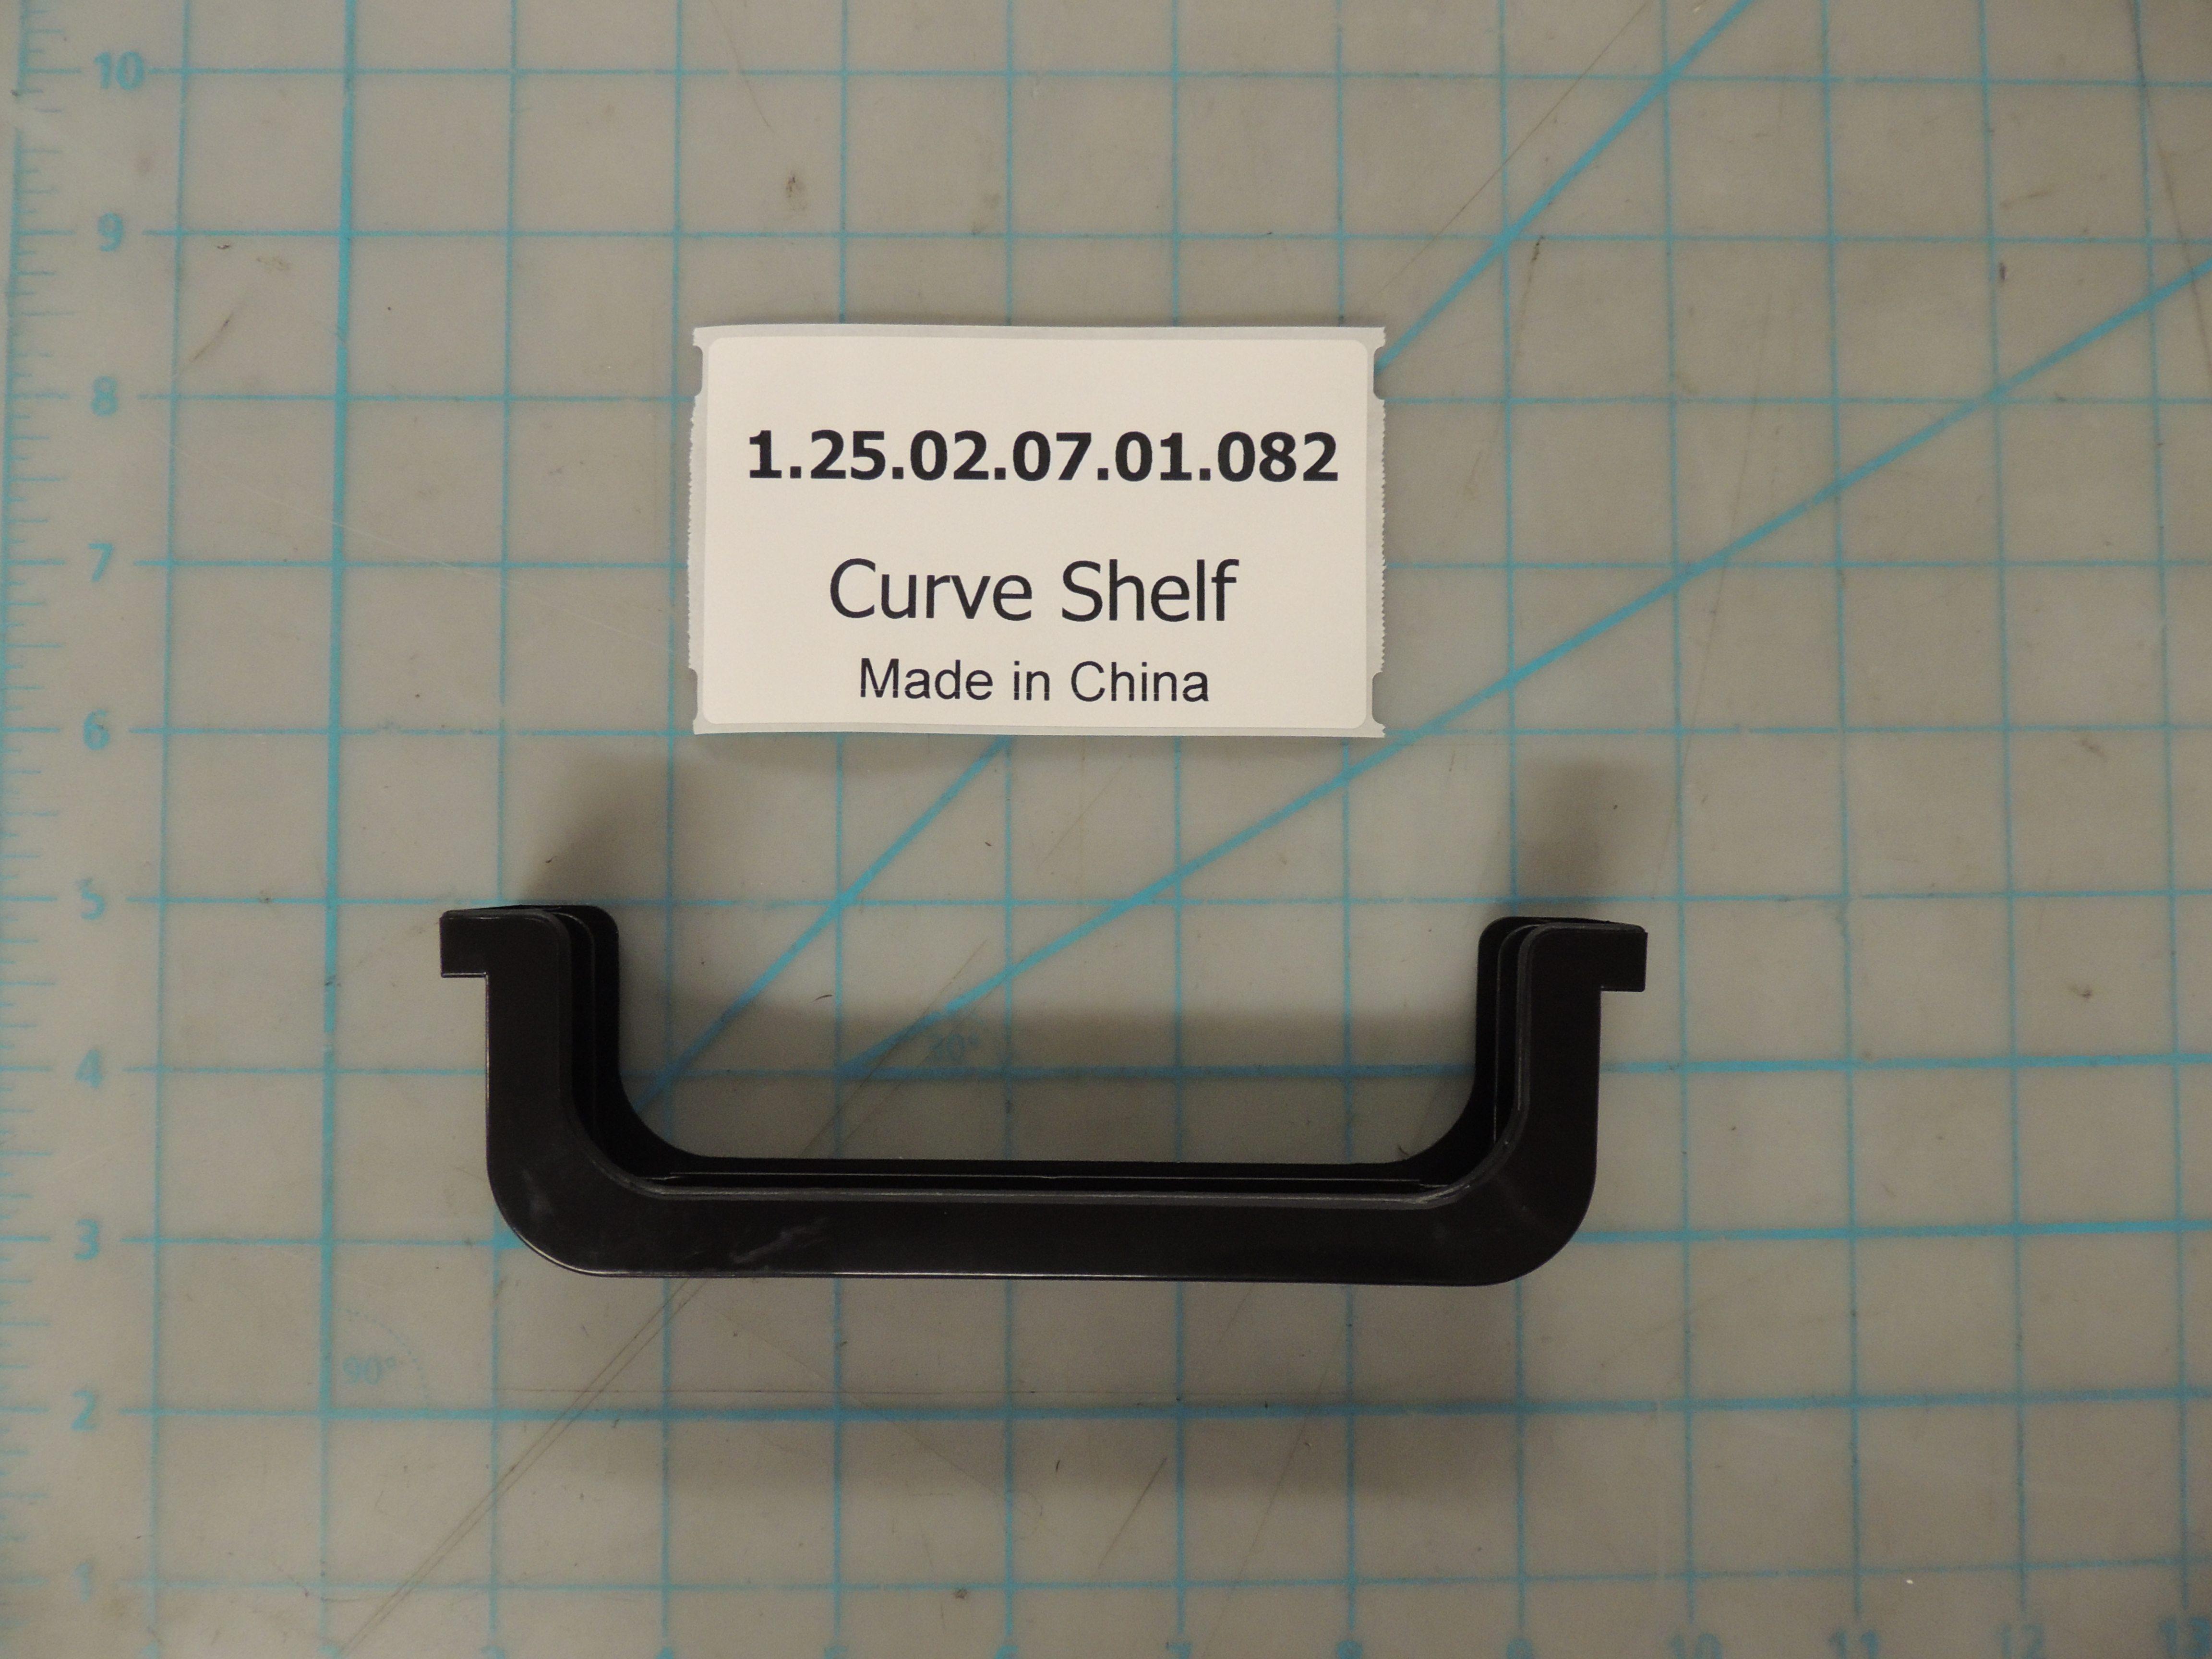 Curve Shelf